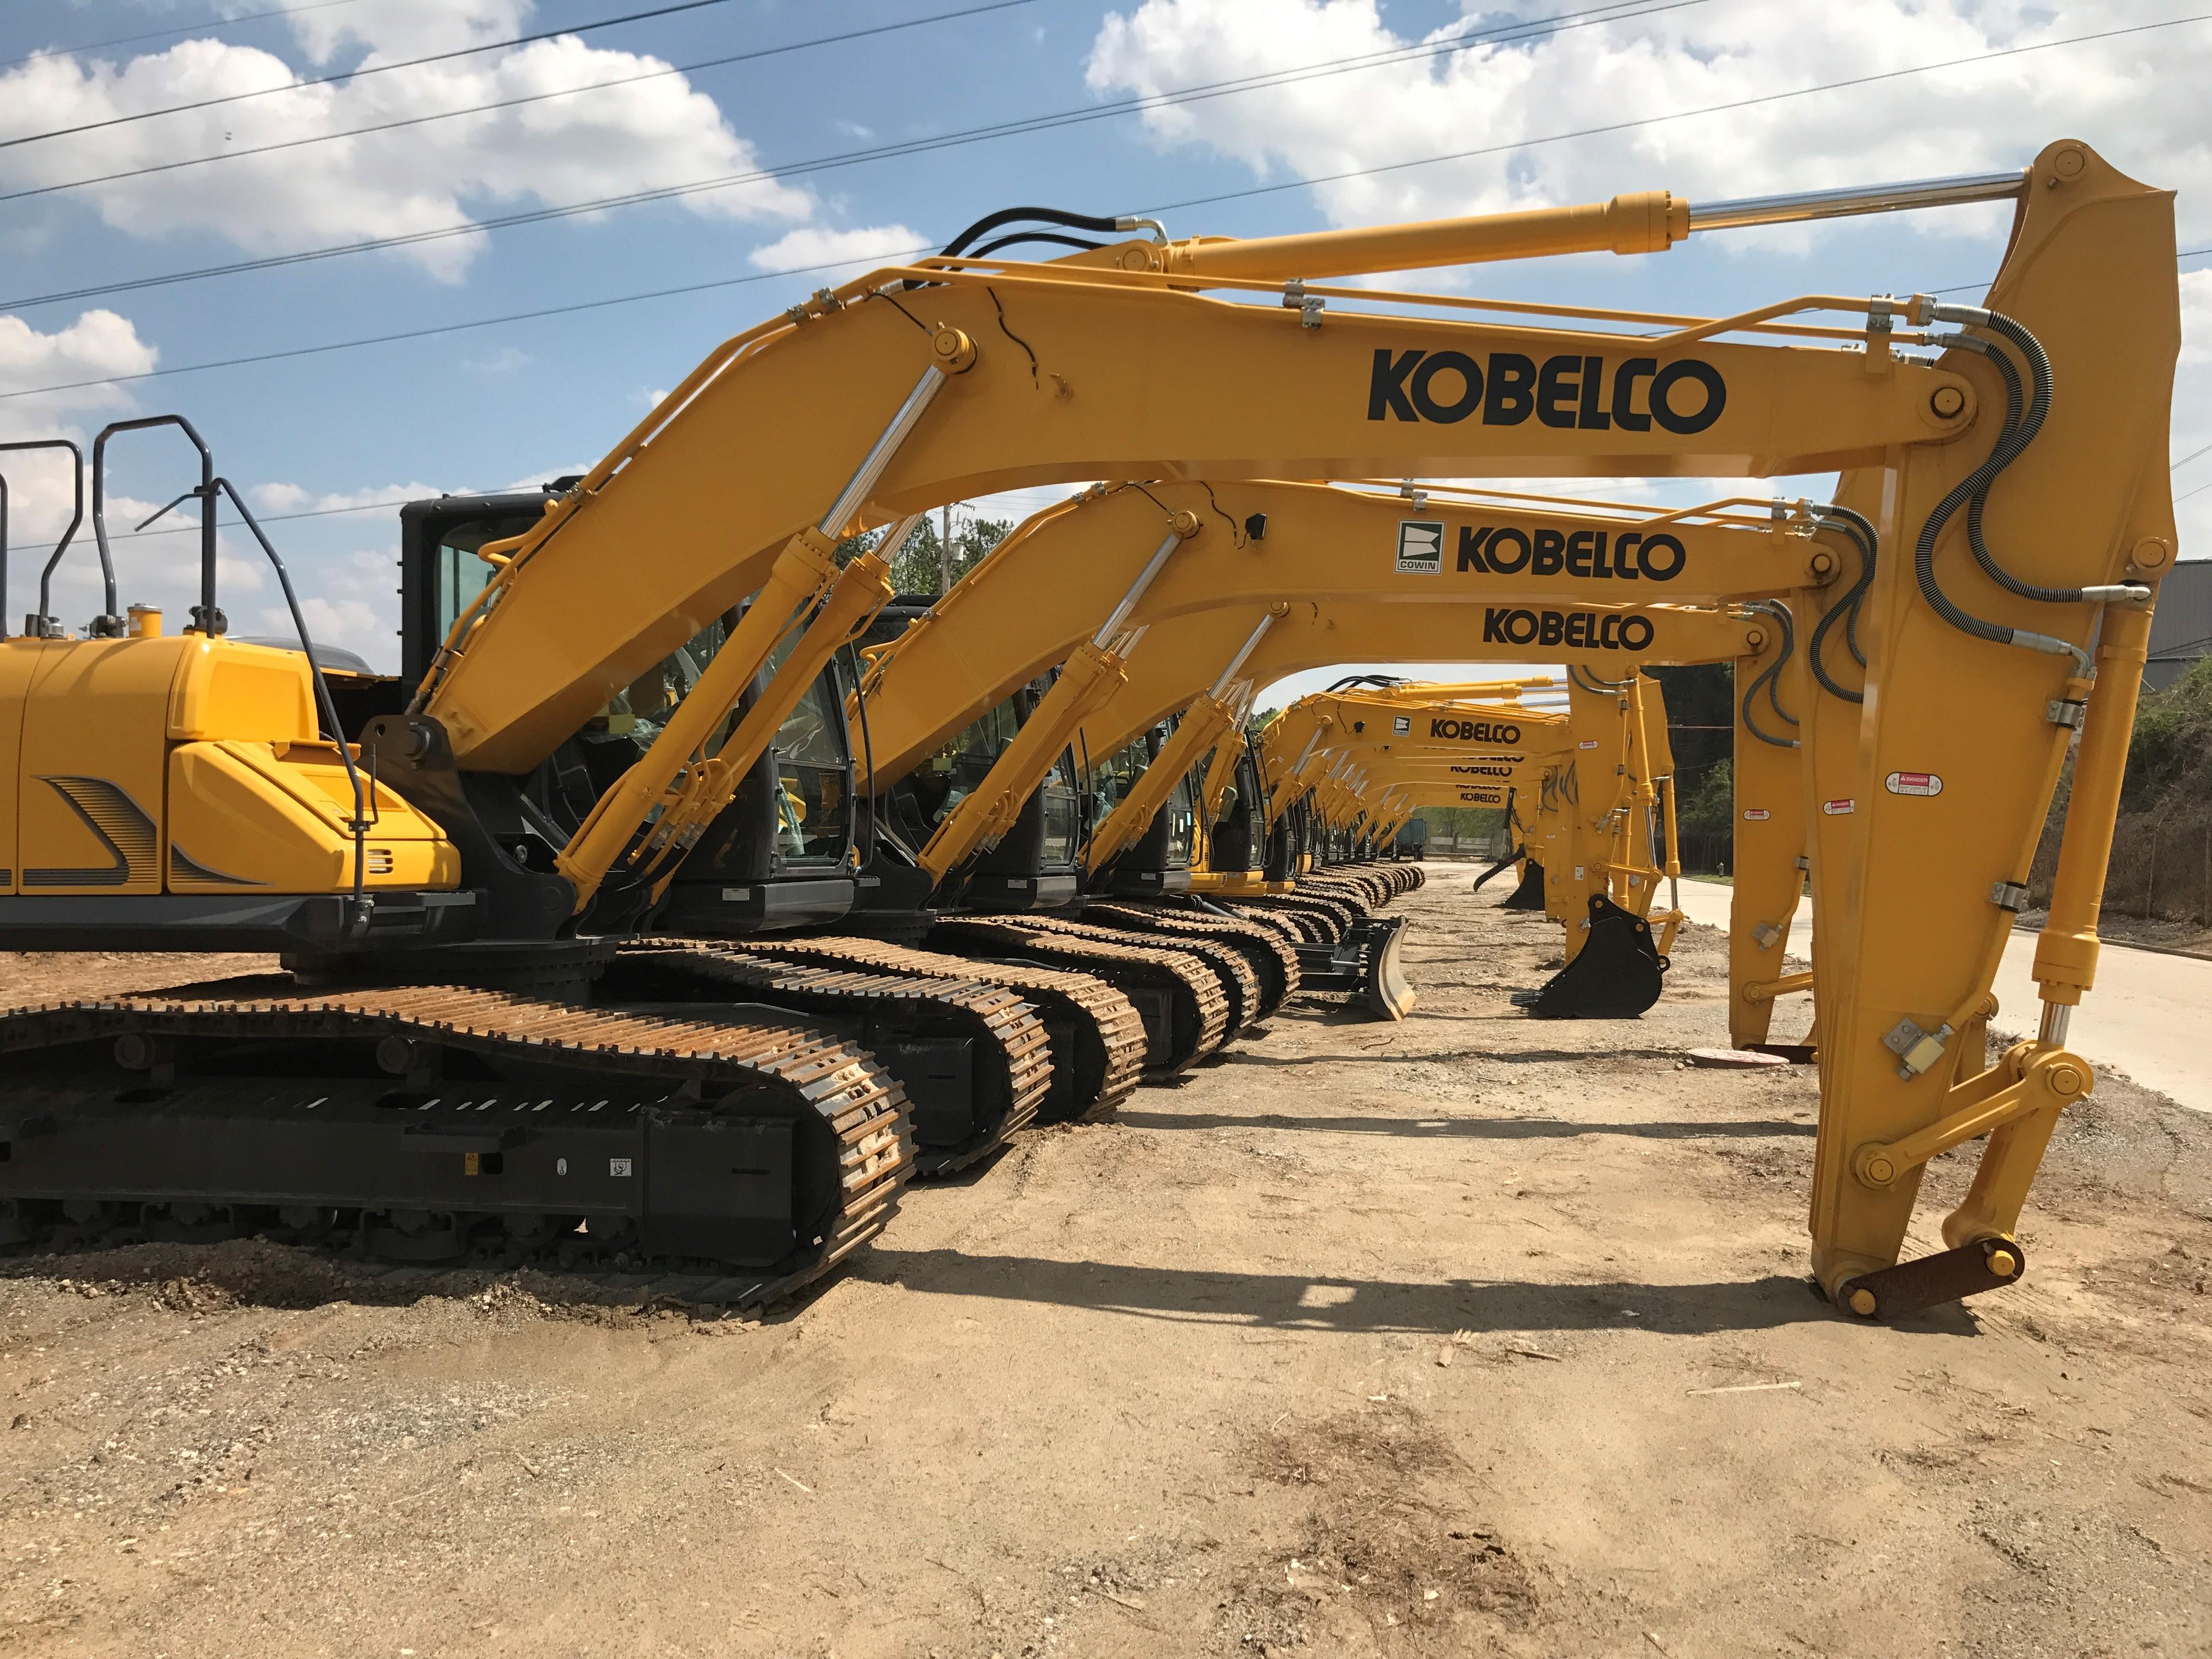 Kobelco 1 - Cowin Equipment Company, Inc